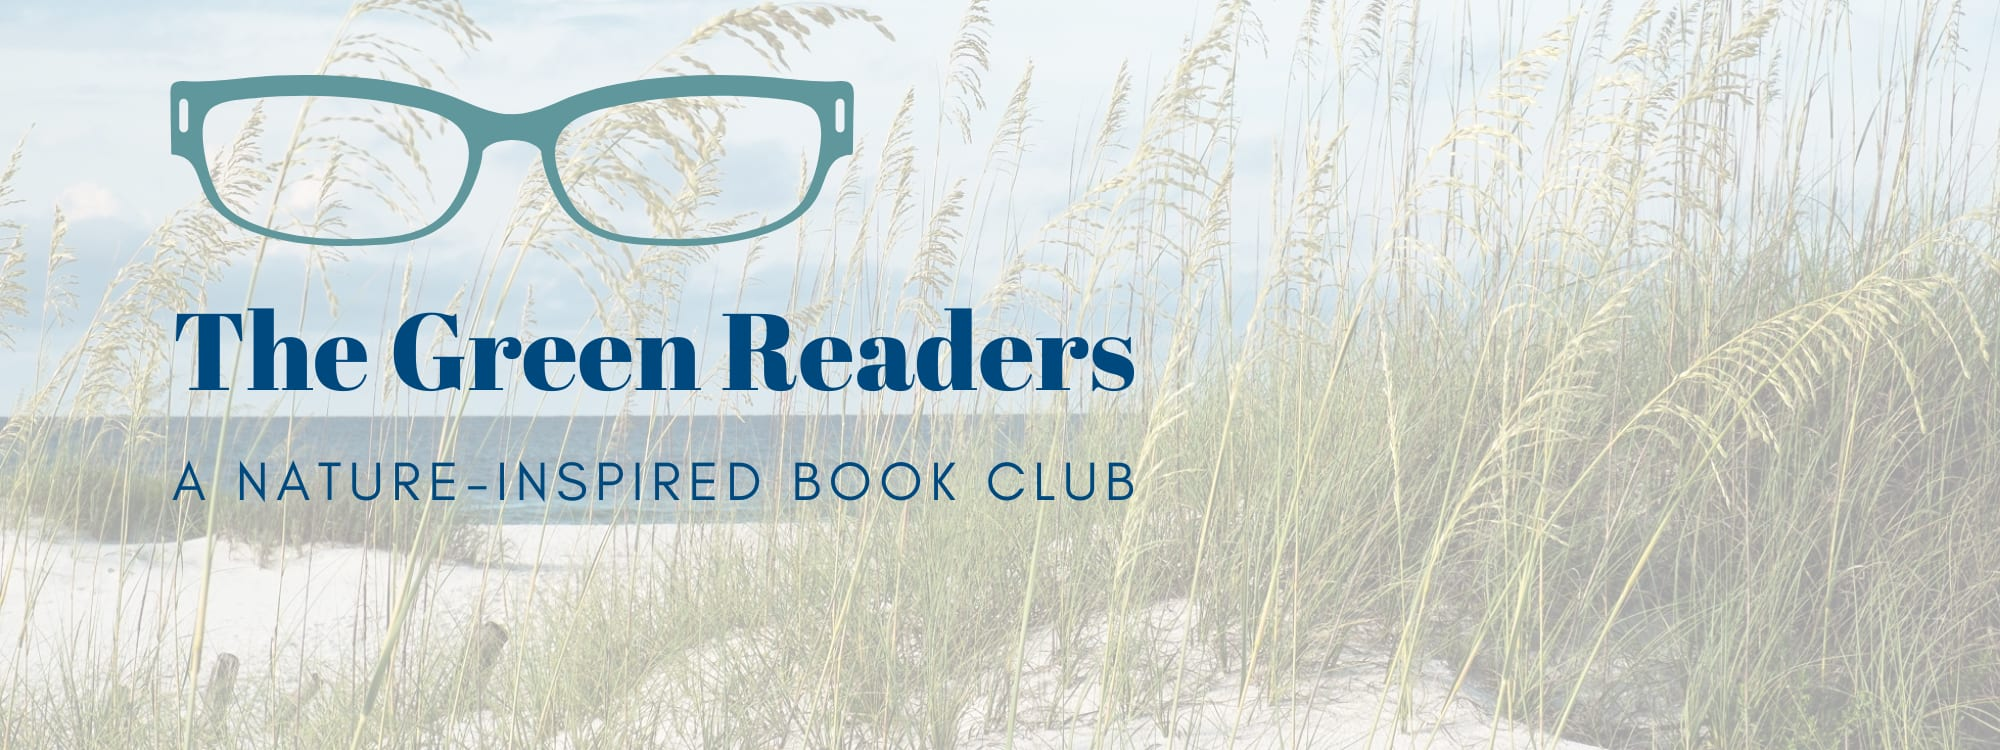 New Book Club